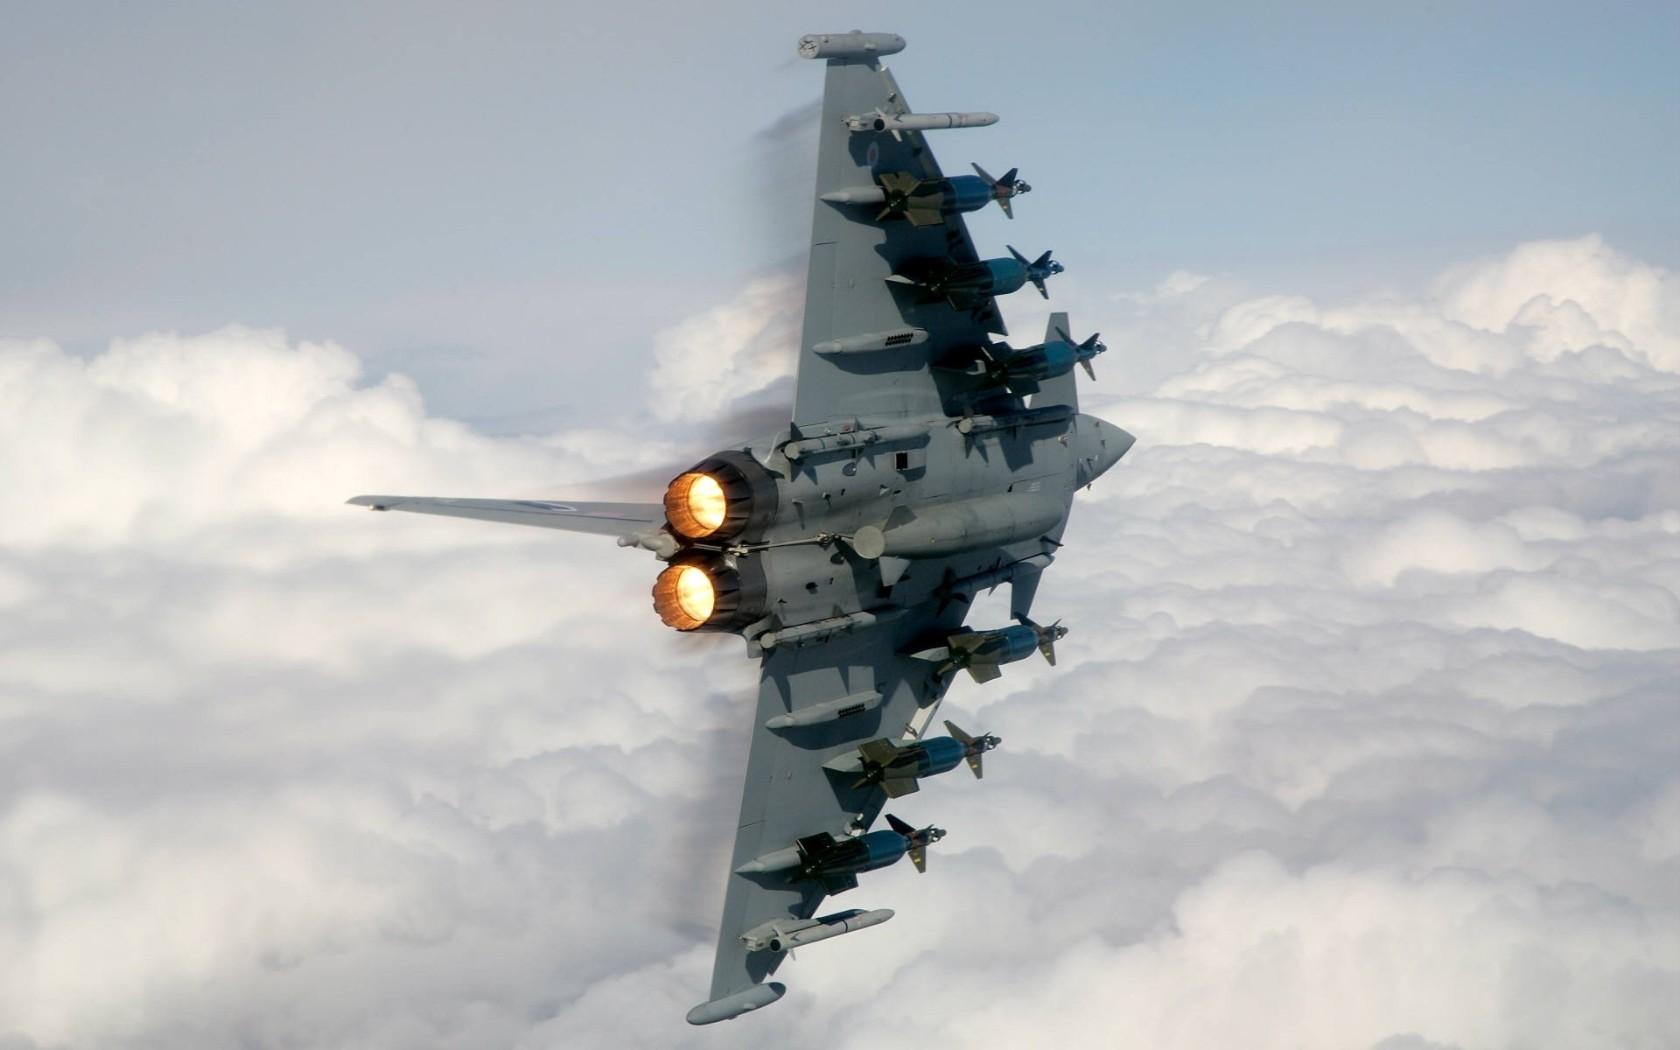 Обои Mcdonnell douglas, истребитель, Самолёт, eagle, Облака. Авиация foto 13